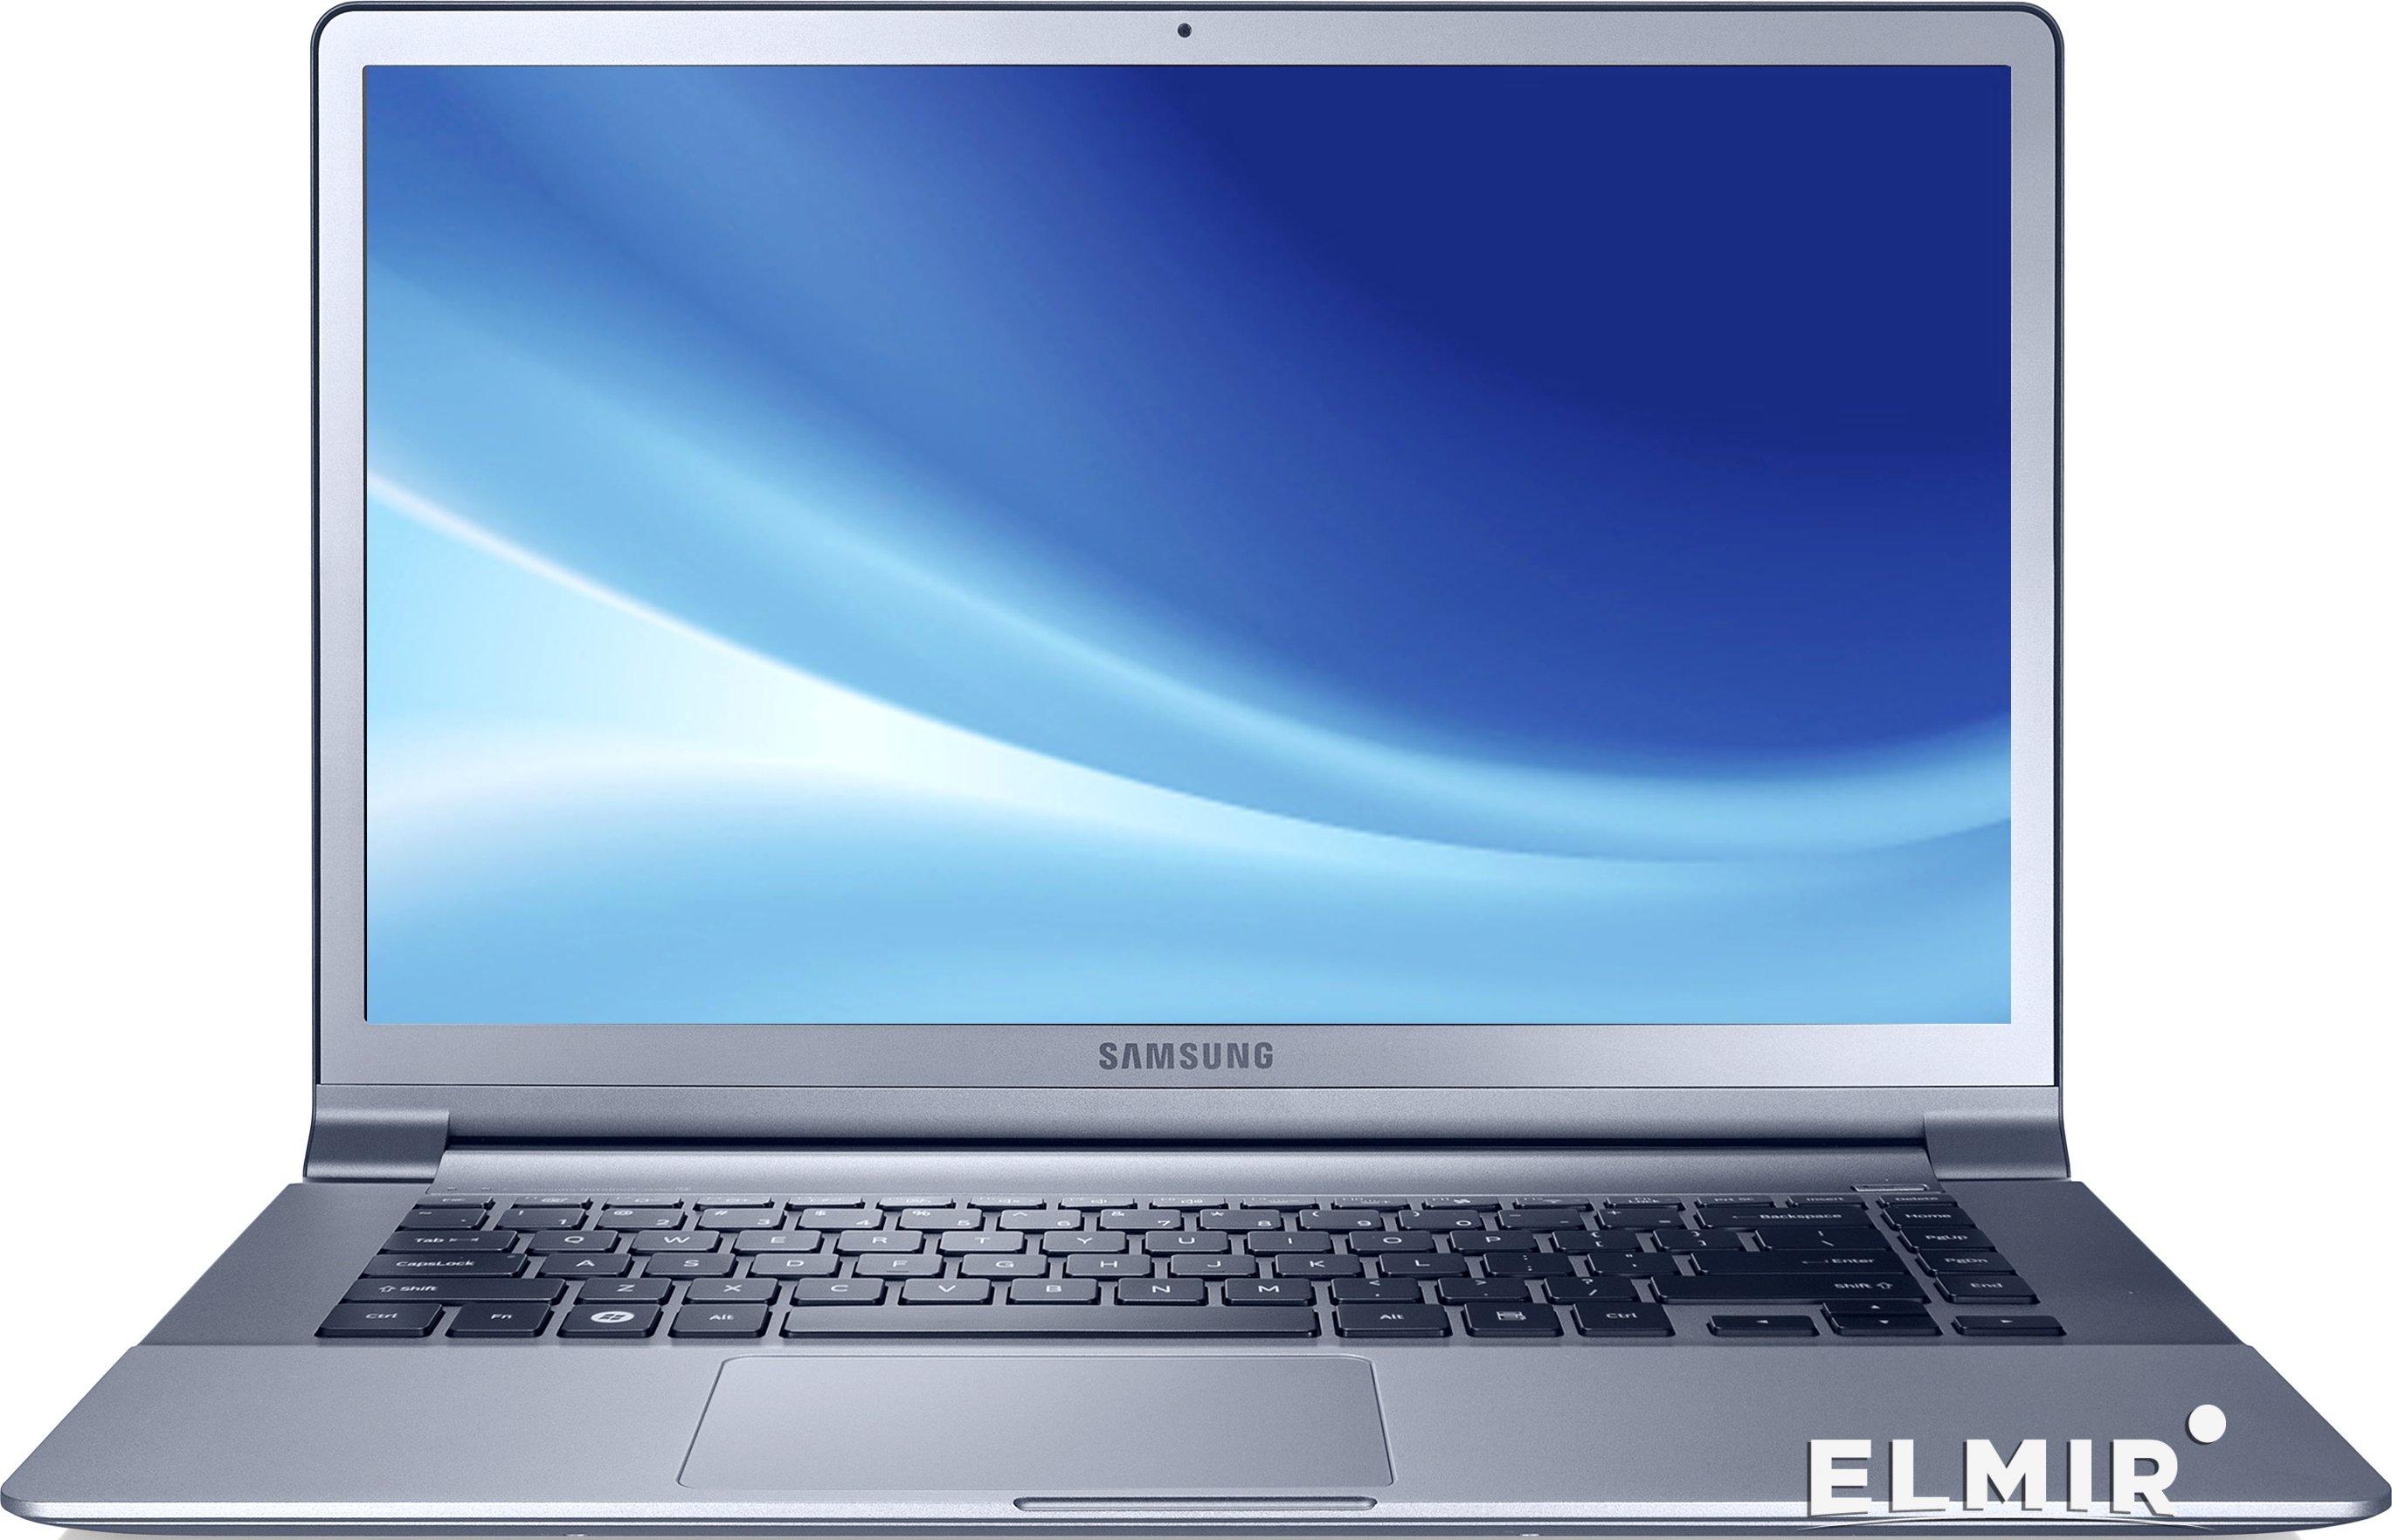 Самсунг ноутбук картинки на фоне стола